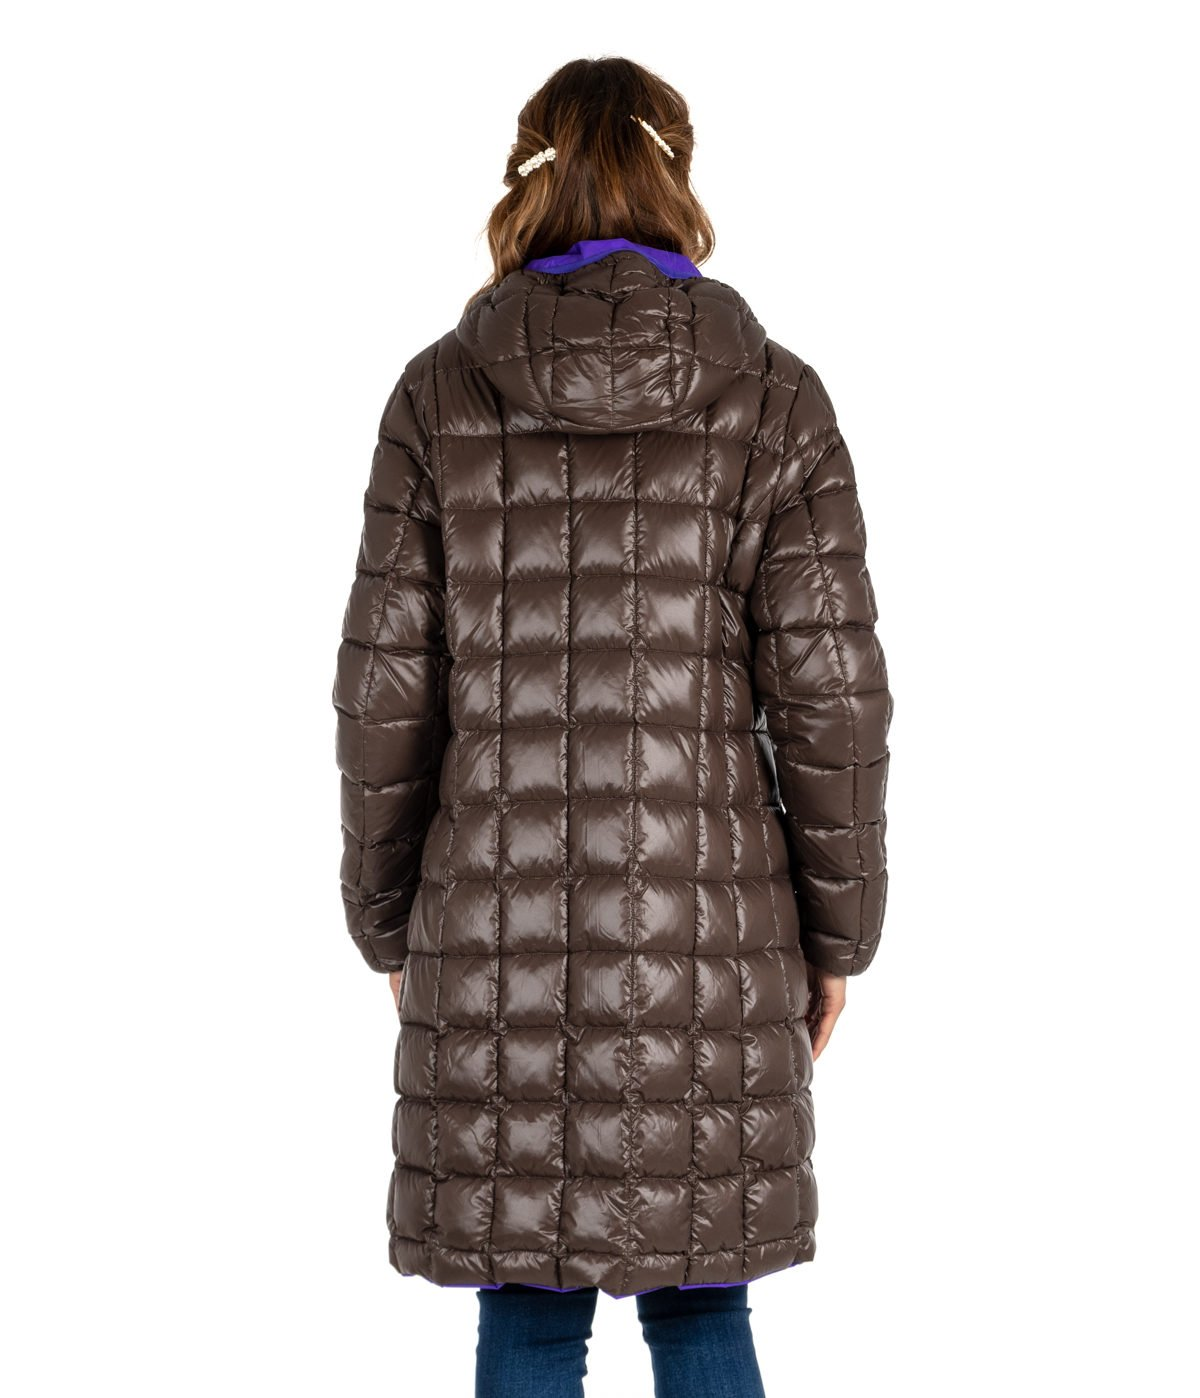 sale retailer 478a6 74086 GIUBBINO DONNA K-WAY MARRONE PIUMINO DOUBLE CHARLENE VIOLET H-BROWN